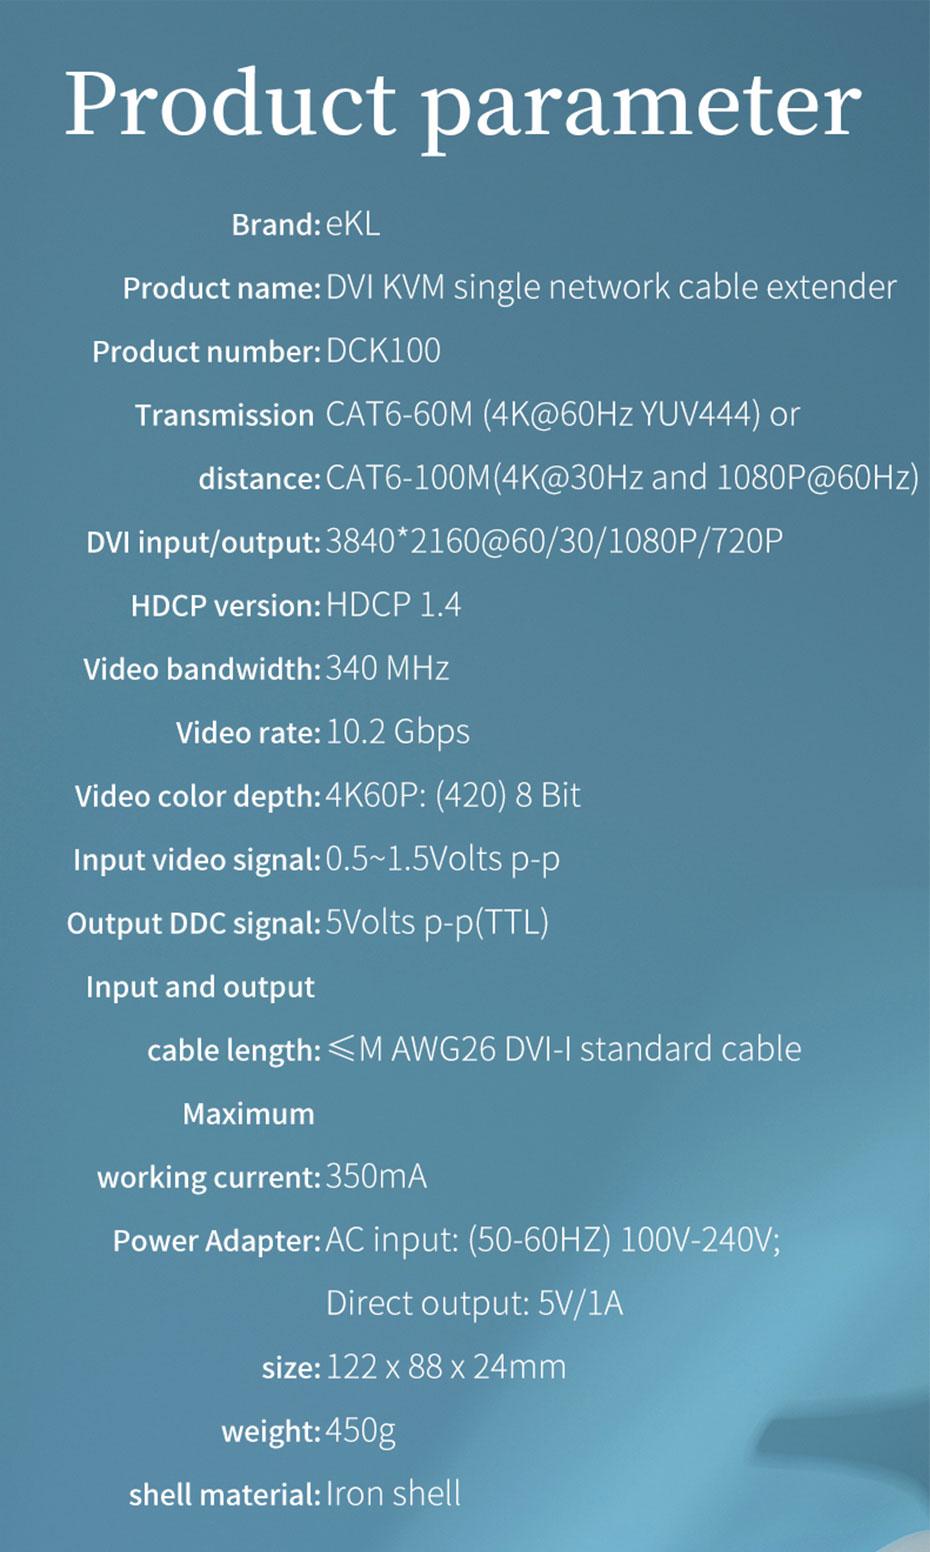 100m DVI KVM single network cable extender DCK100 specifications